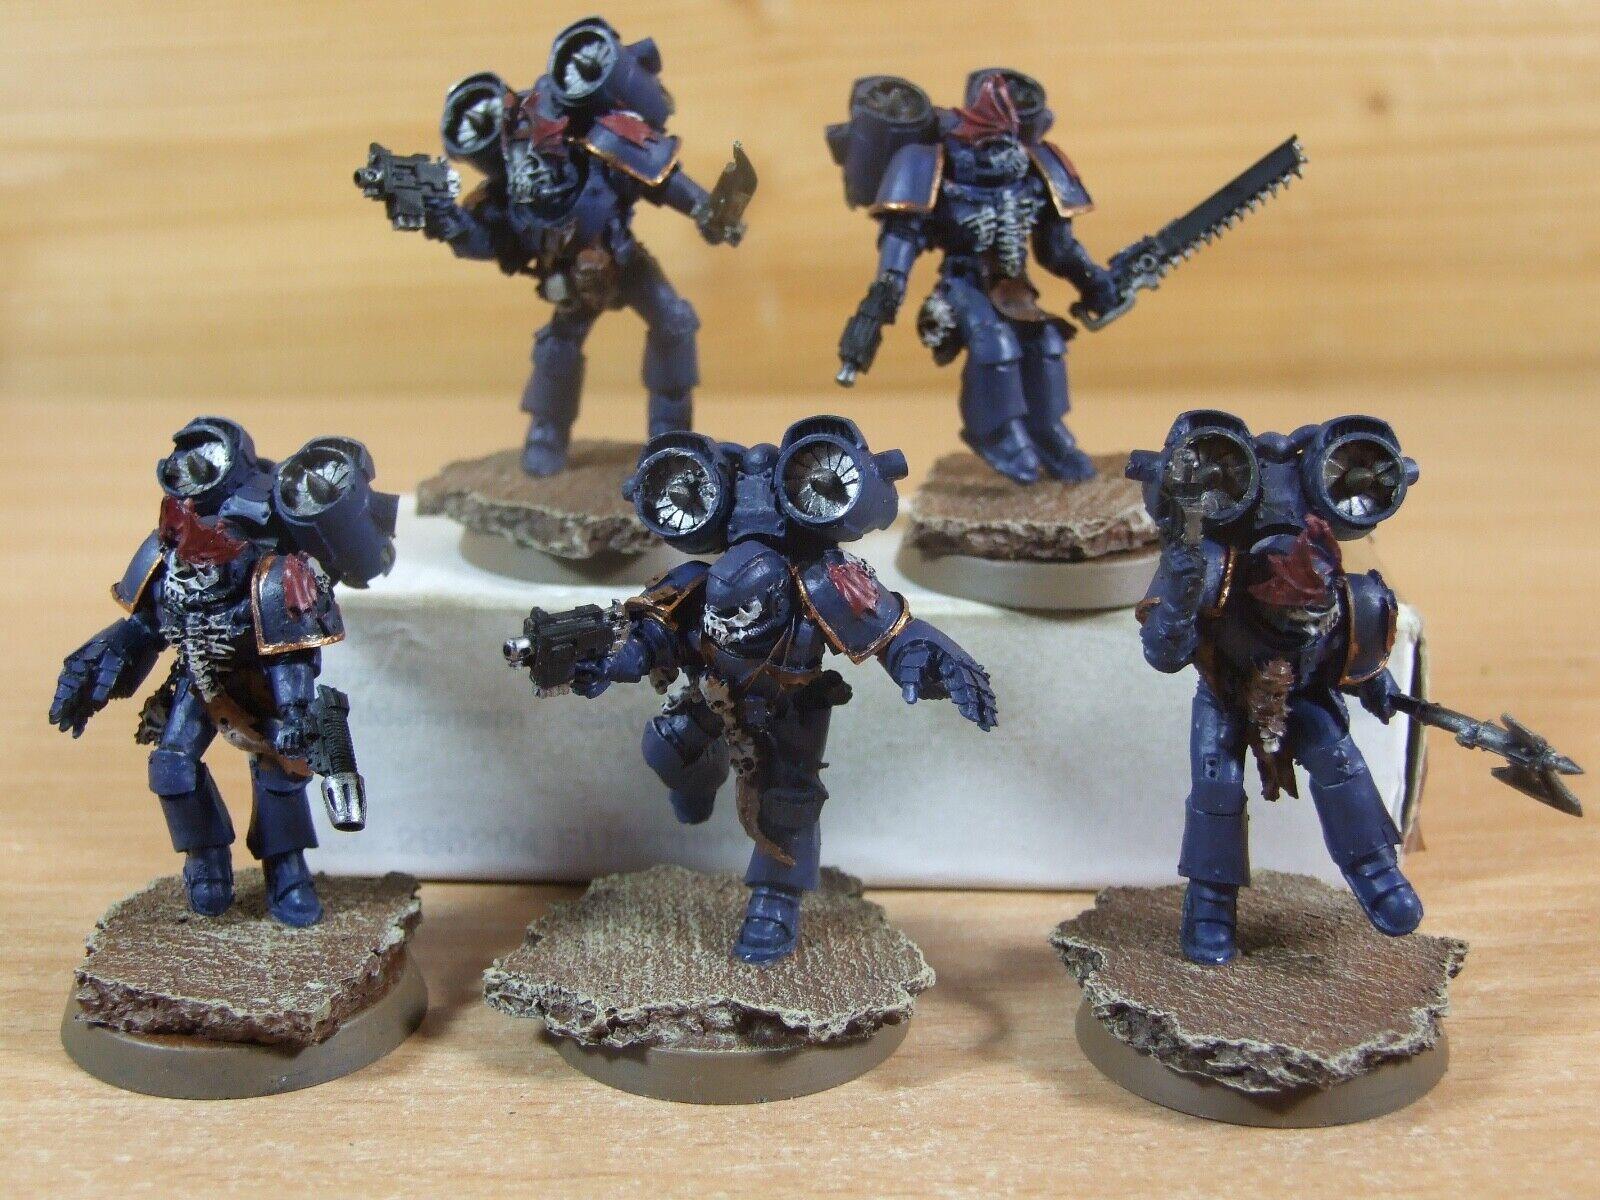 5 Forgeworld Warhammer noche señores Raptors bien pintados (L-038)